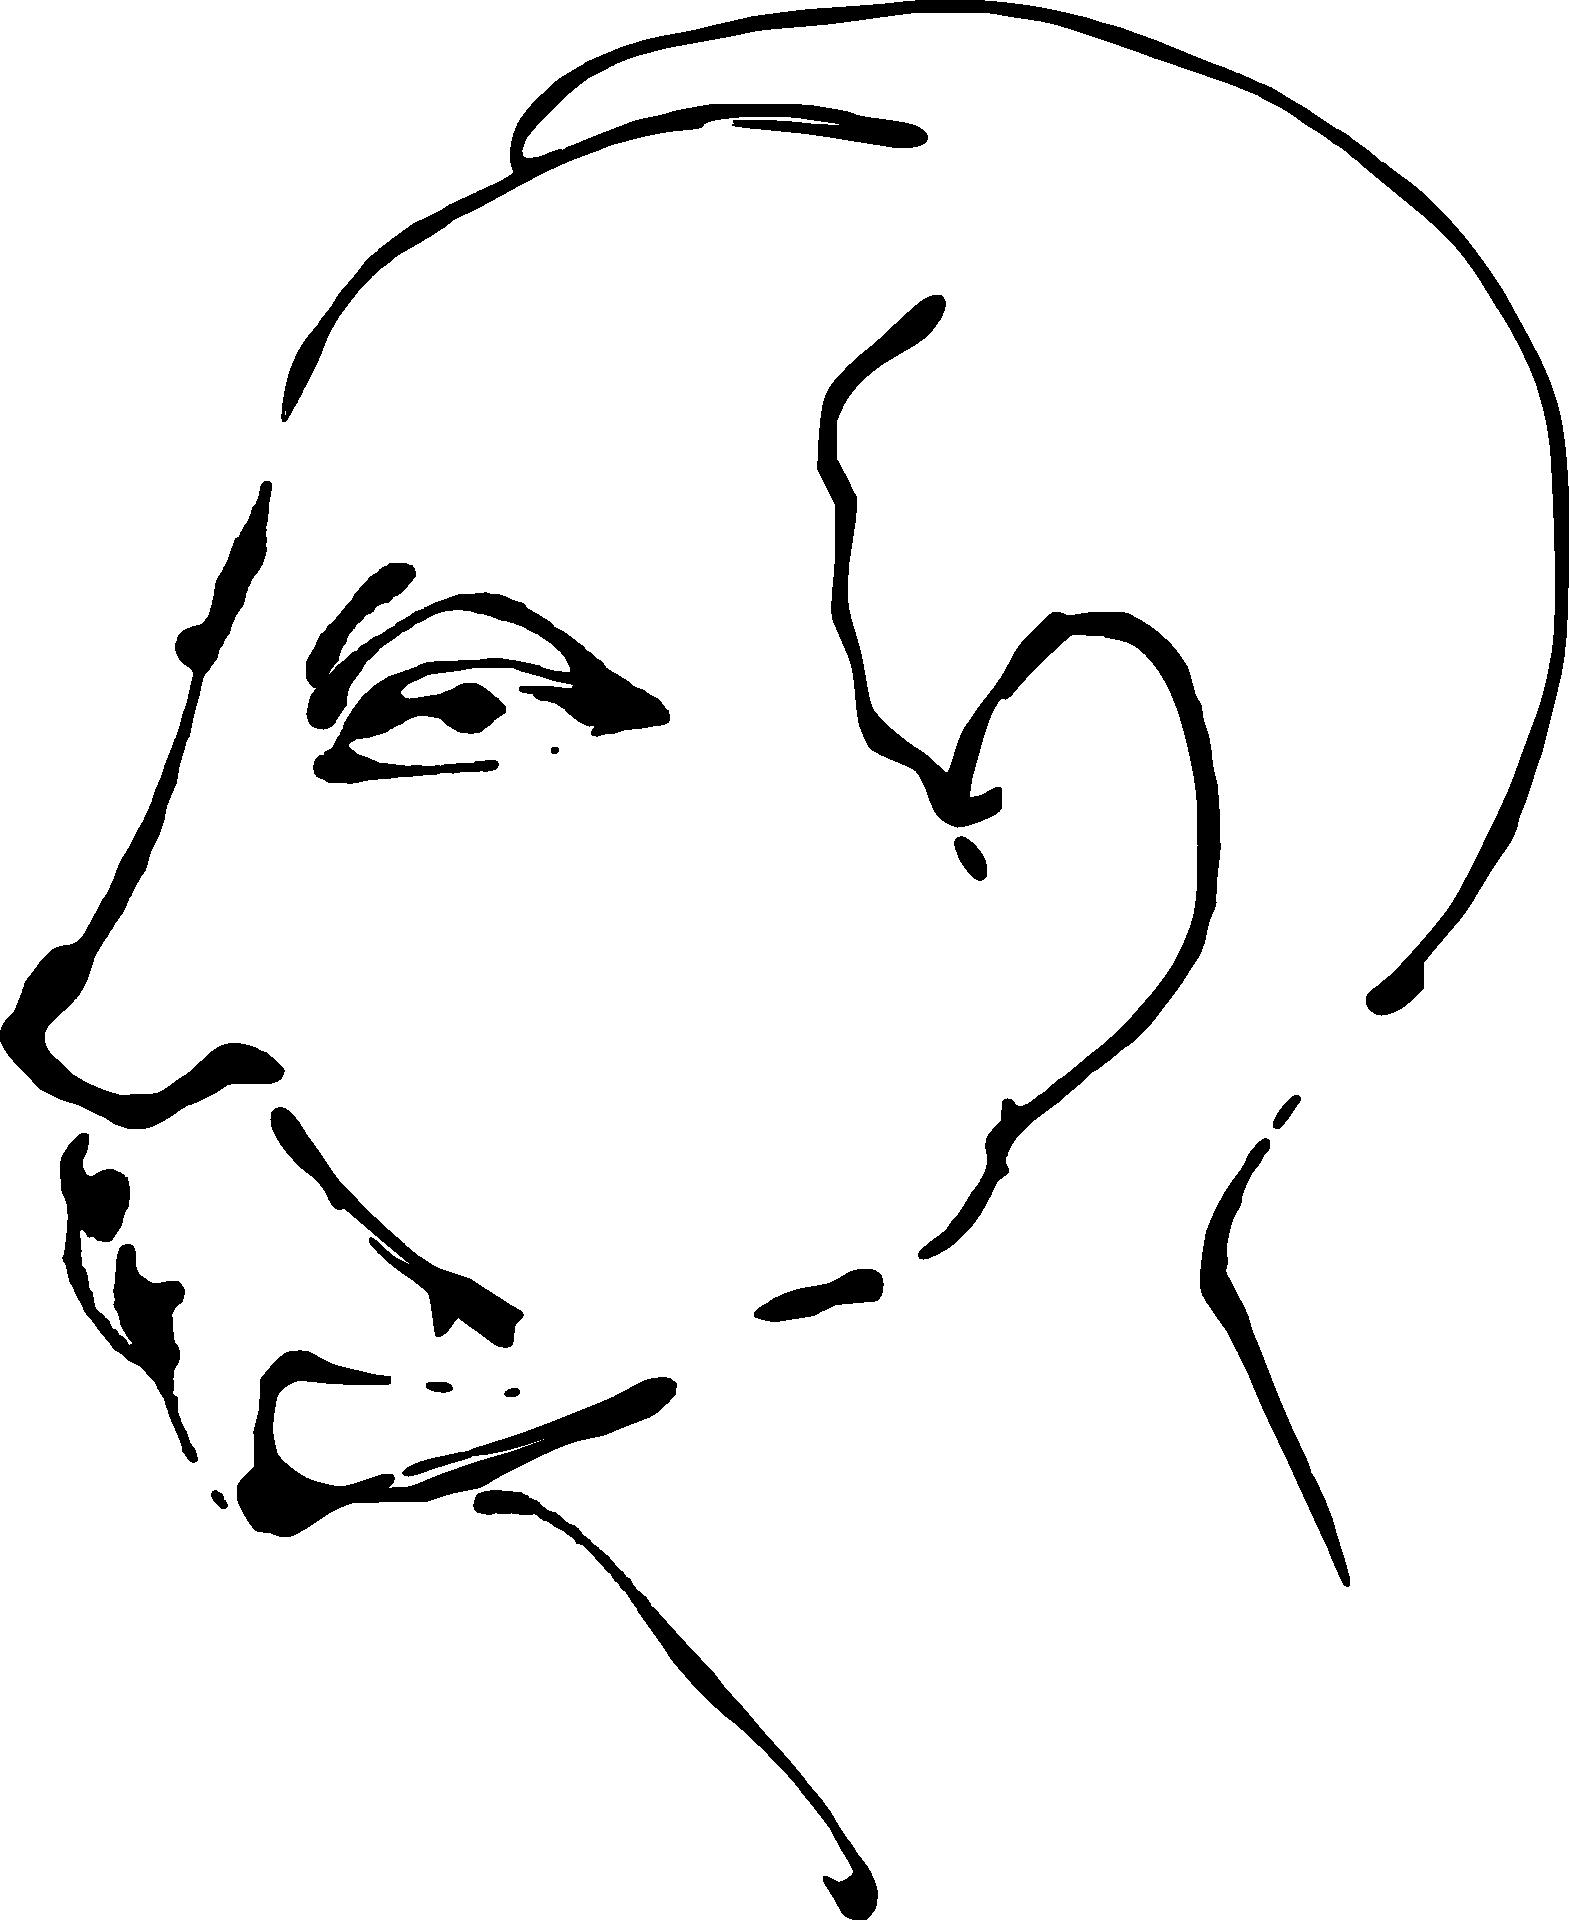 Profile Of Moustache Man Sketch Free Image